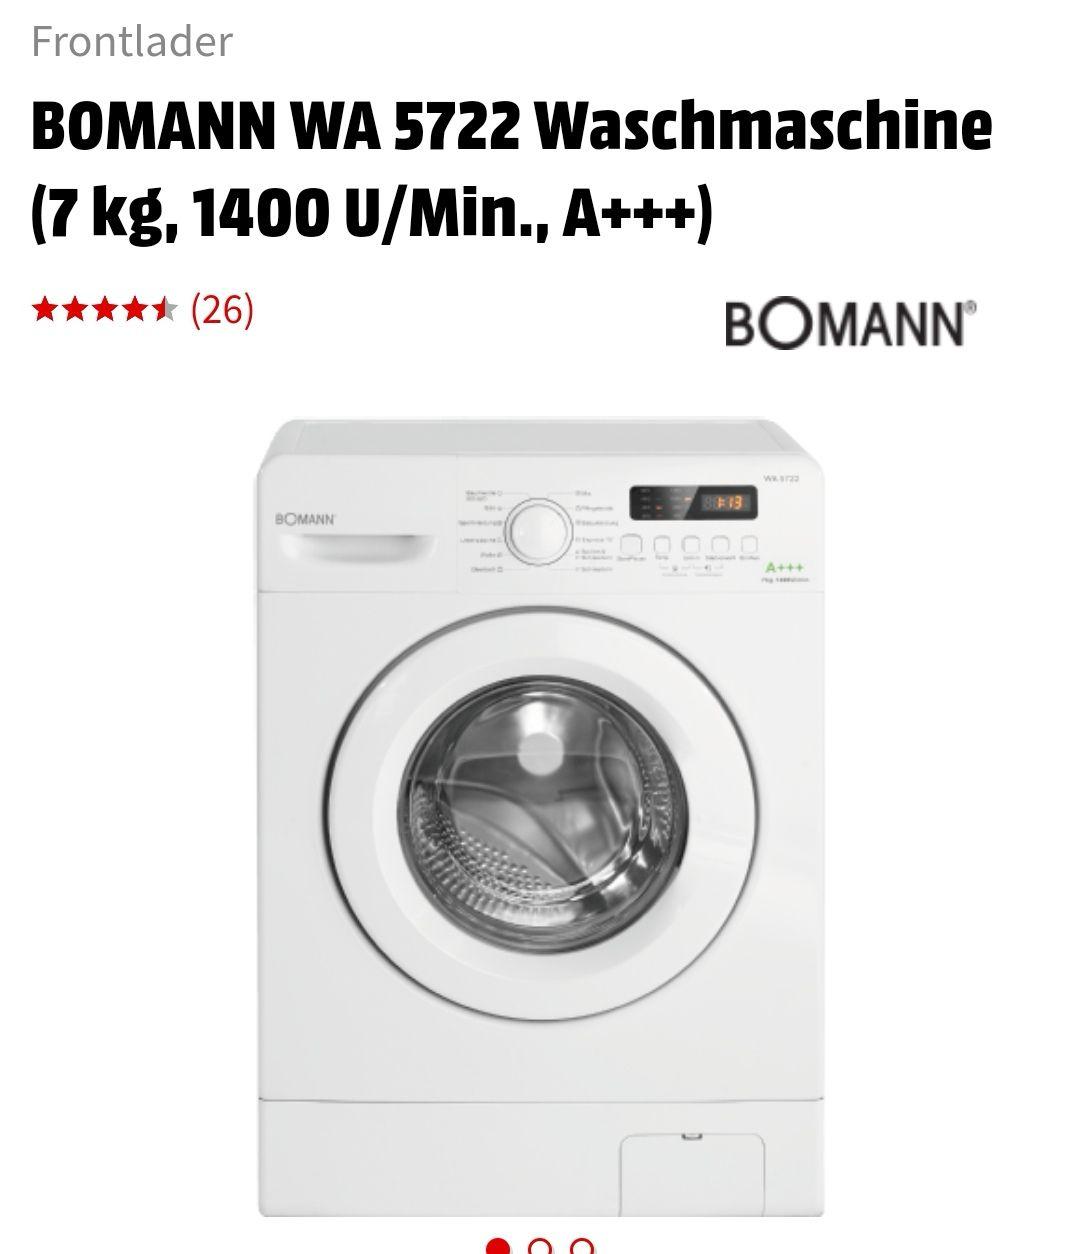 [Lokal Media Markt Gießen] Bomann WA 5722 Frontlader A+++Waschmaschine